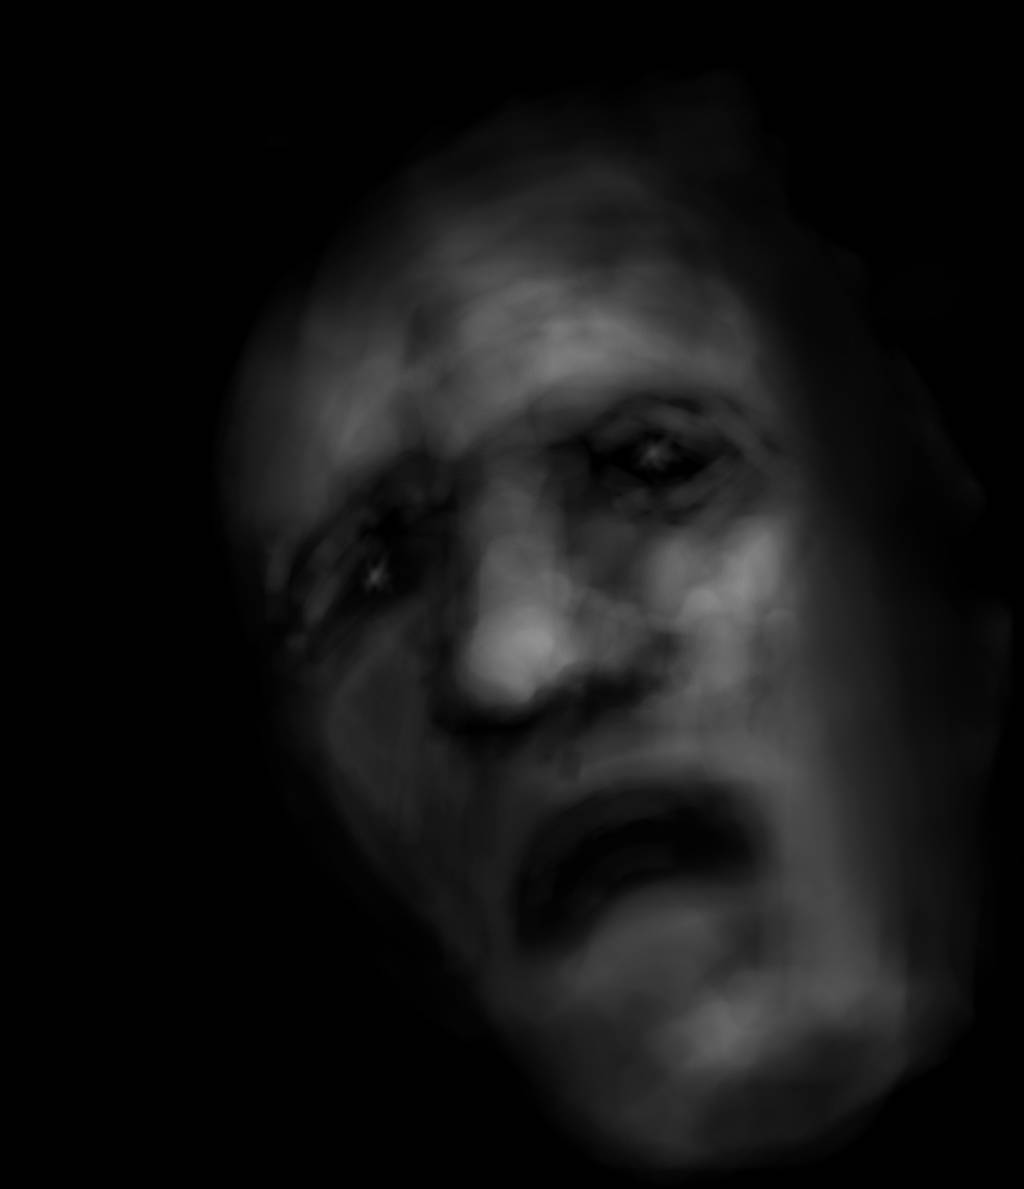 Portrait: Heavy Shadows by MillionPM